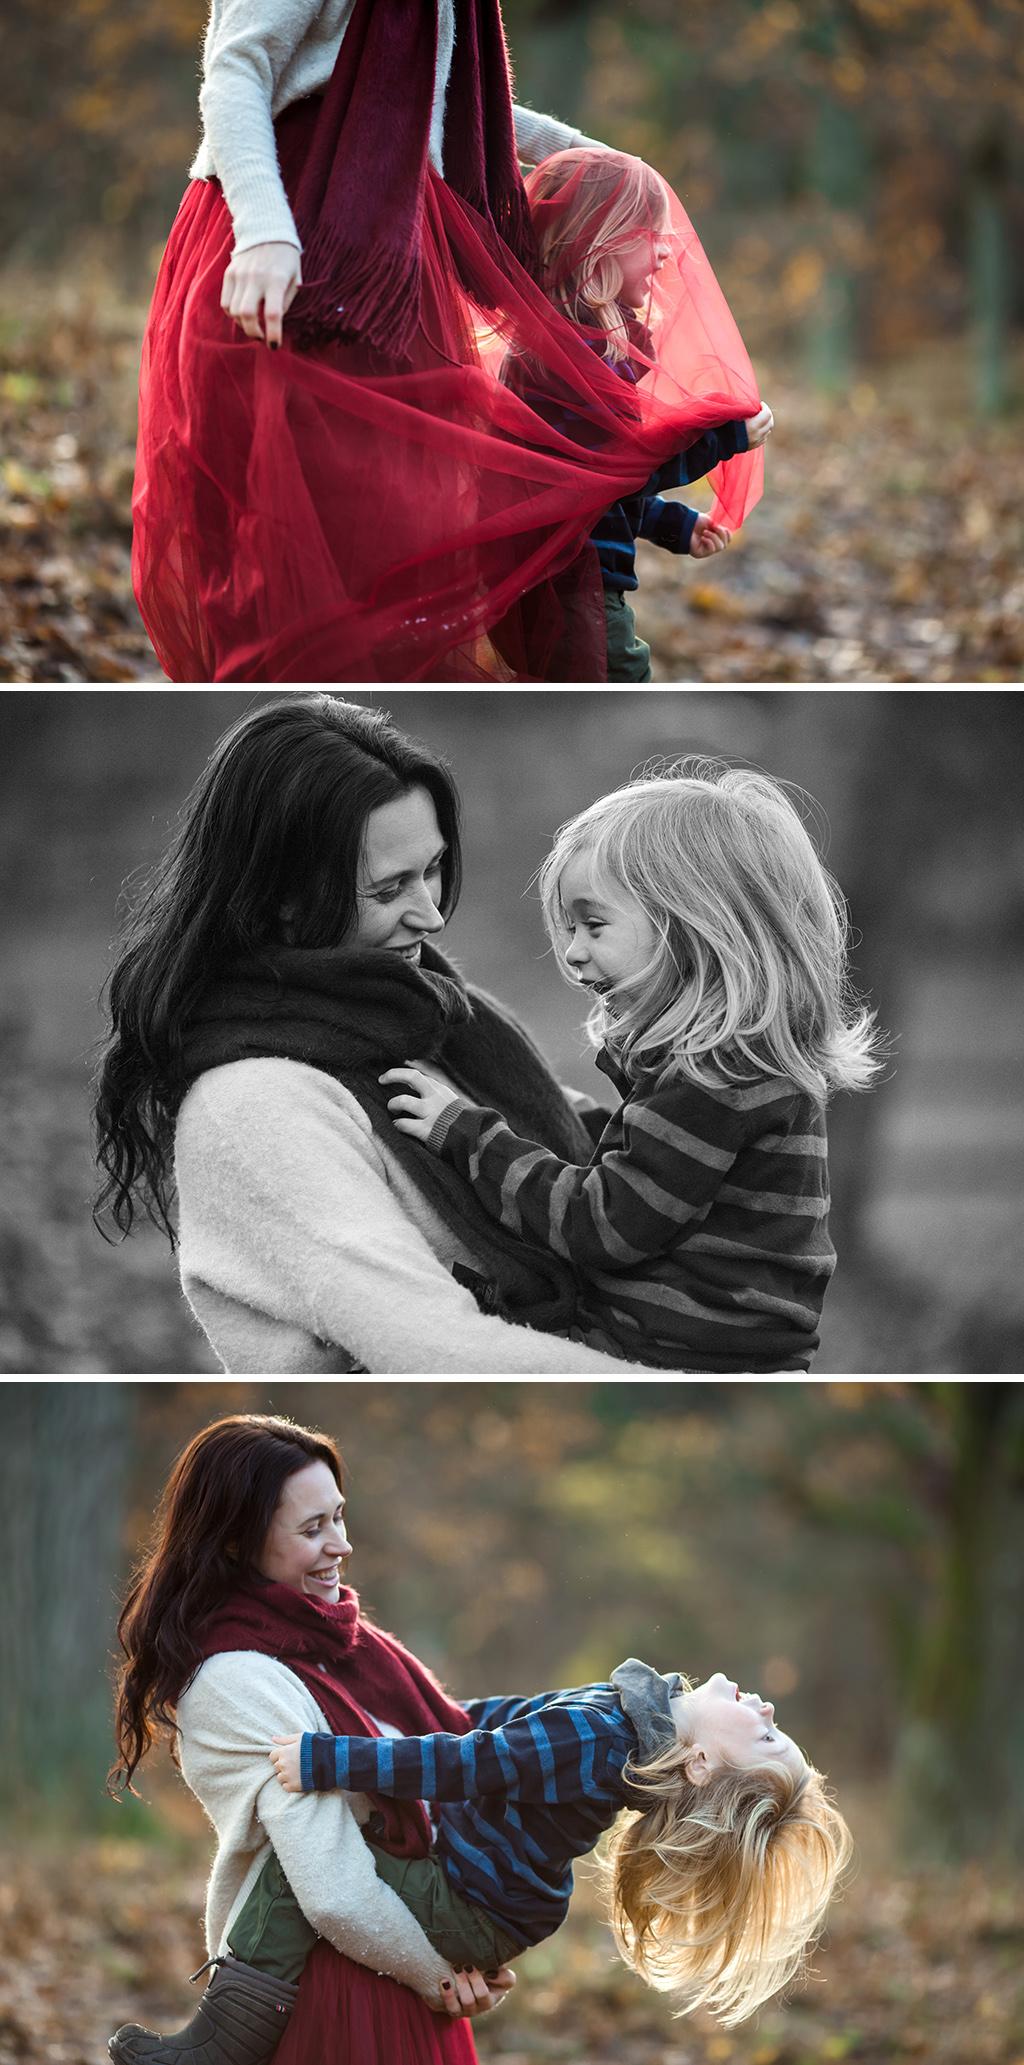 Hostfotografering-i-november-familjefotografering-Stockholm-2.jpg